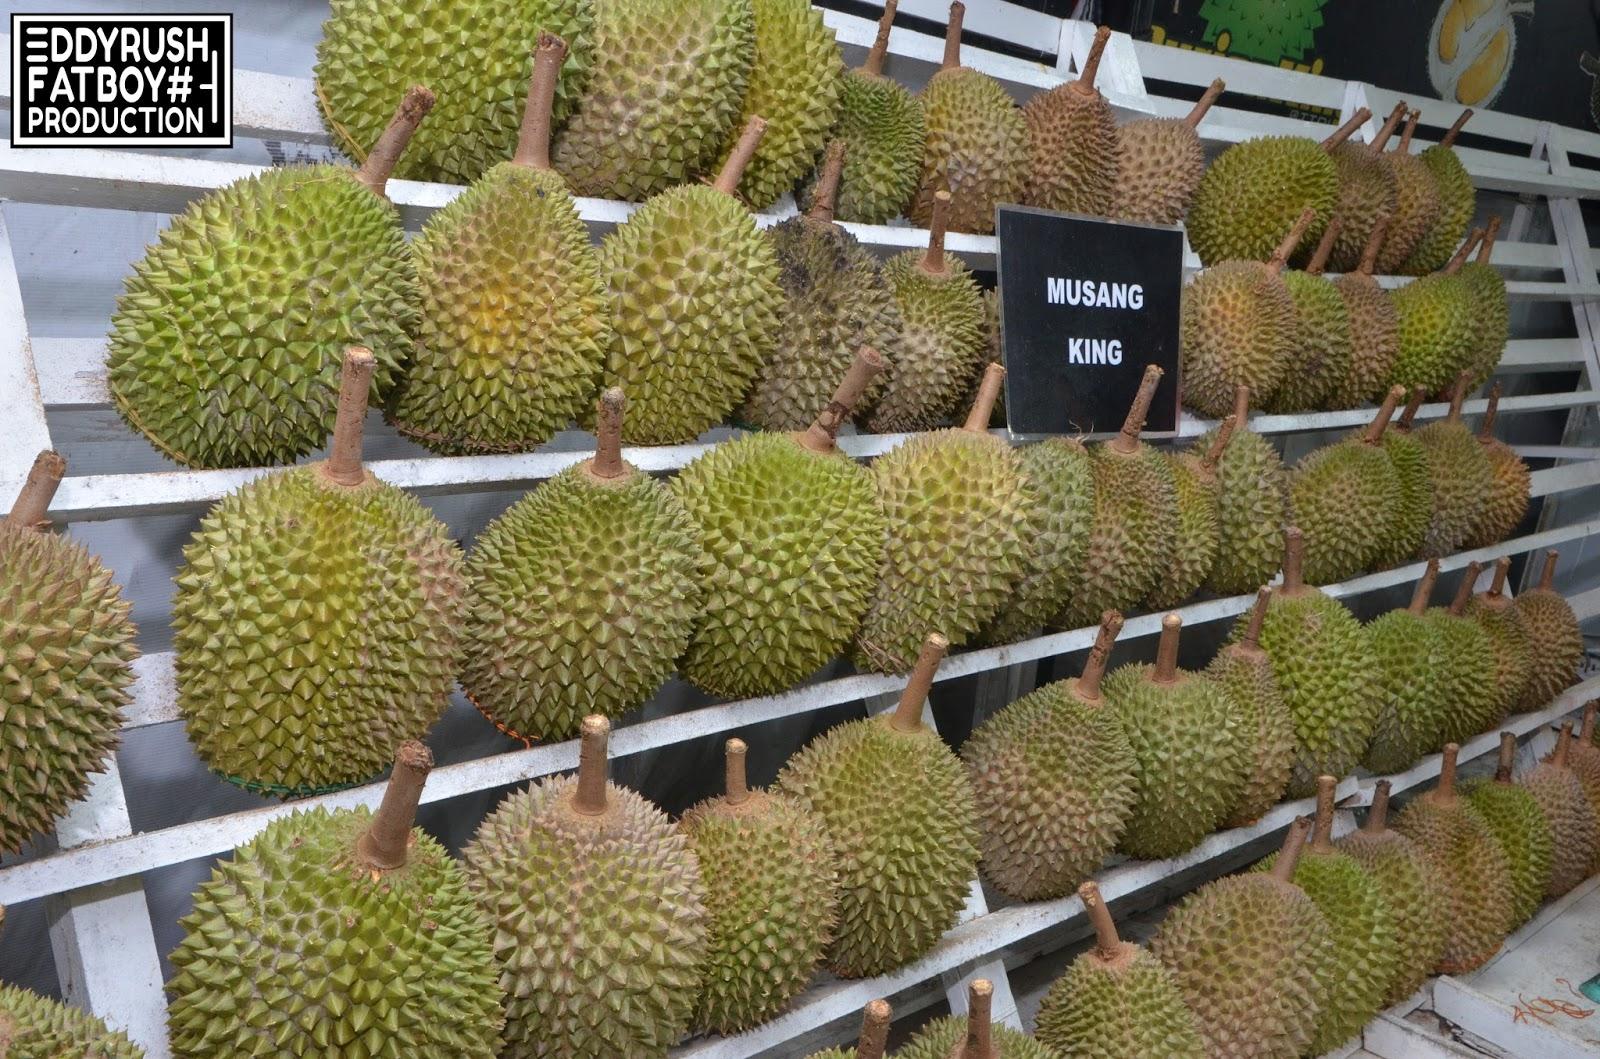 durian king ttdi. Black Bedroom Furniture Sets. Home Design Ideas